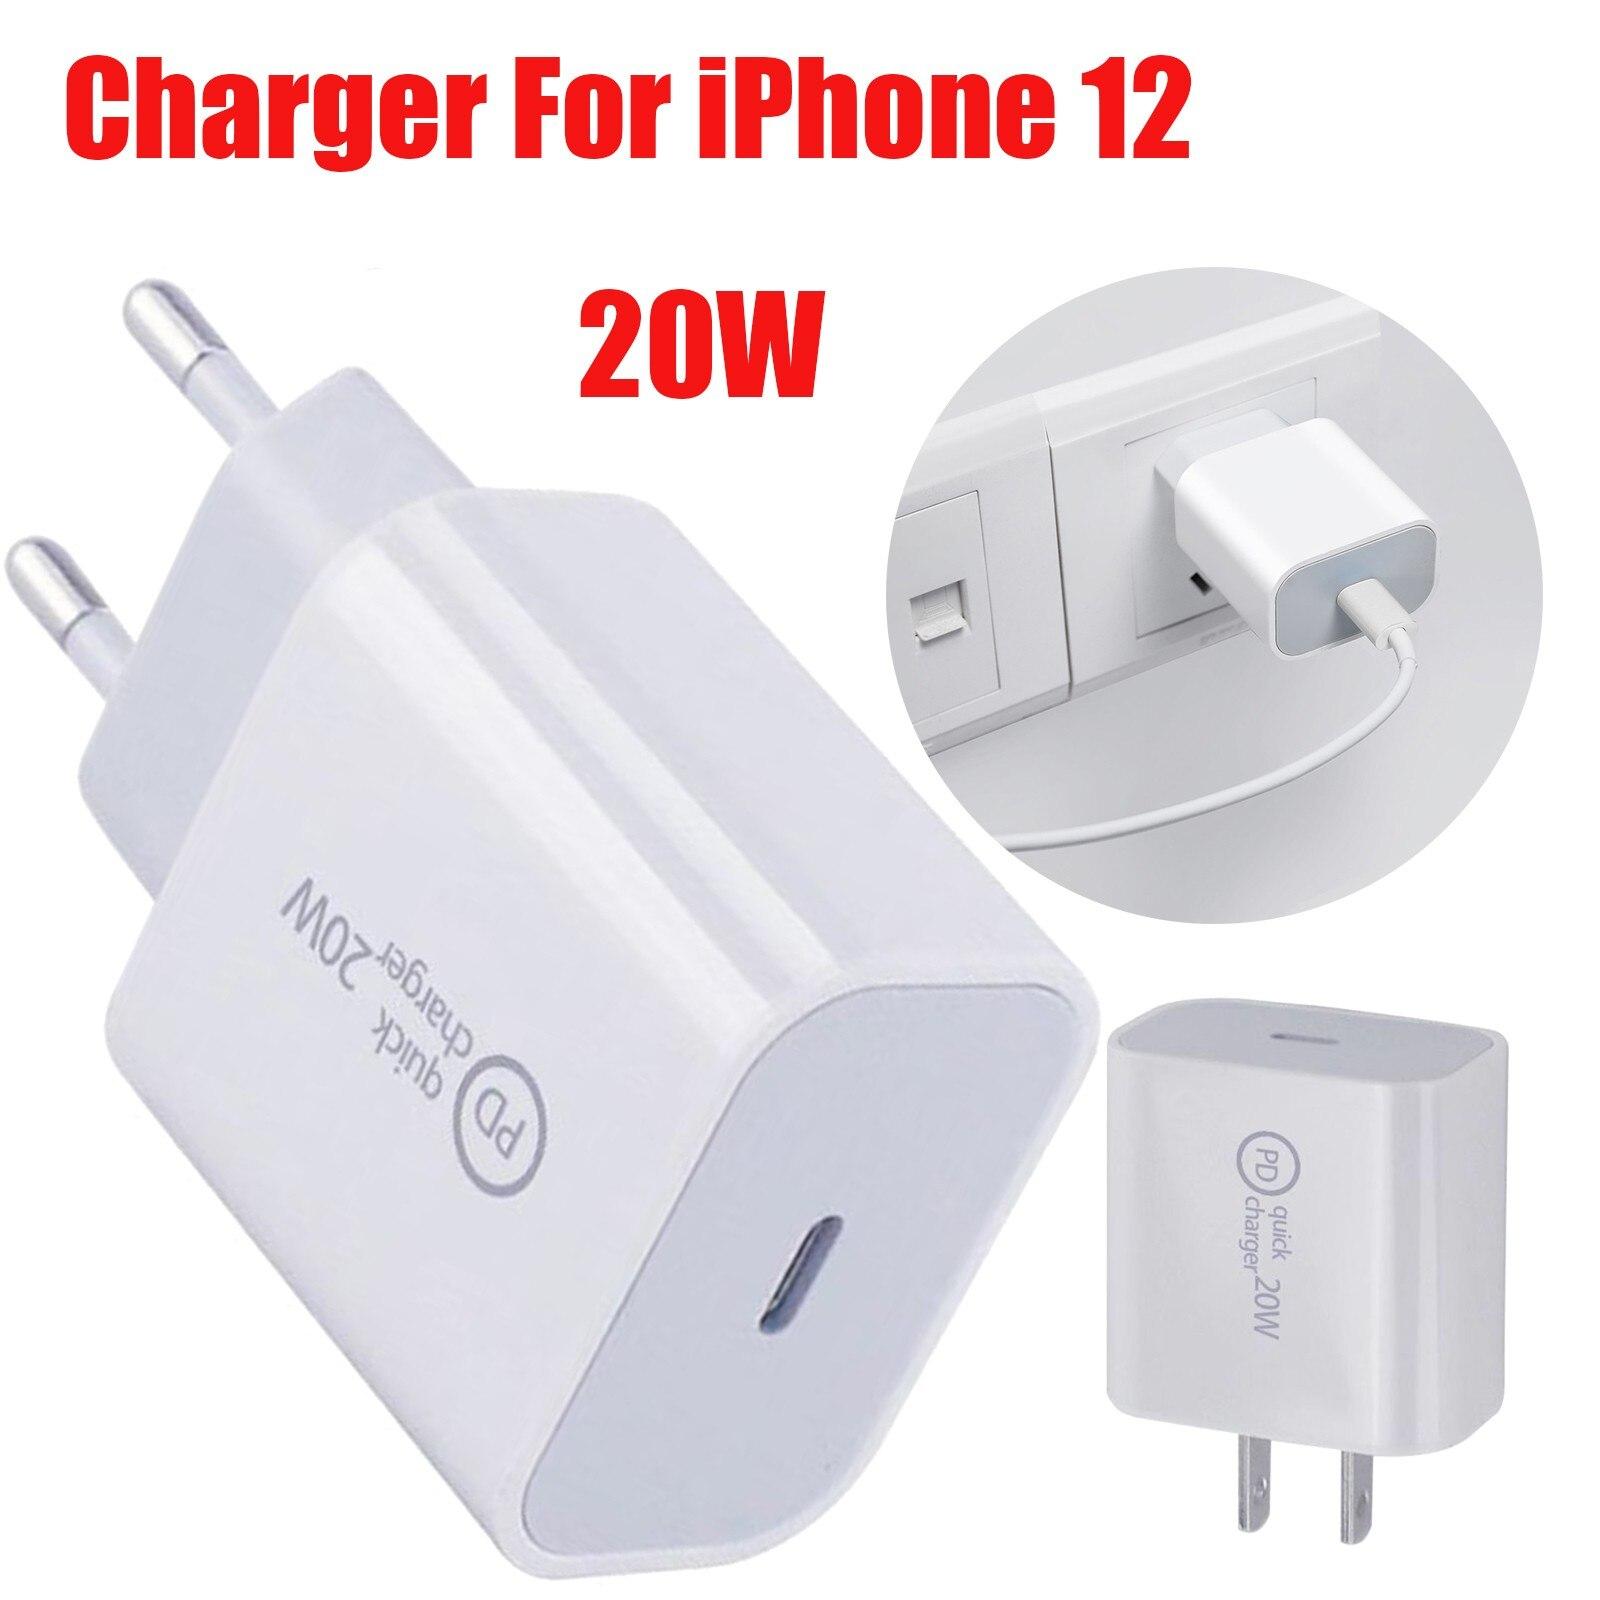 CARPRIE 20 Вт Зарядное устройство USB-C адаптер питания Быстродействующее зарядное устройство для iPhone 12 адаптер быстрой зарядки зарядное устройс...